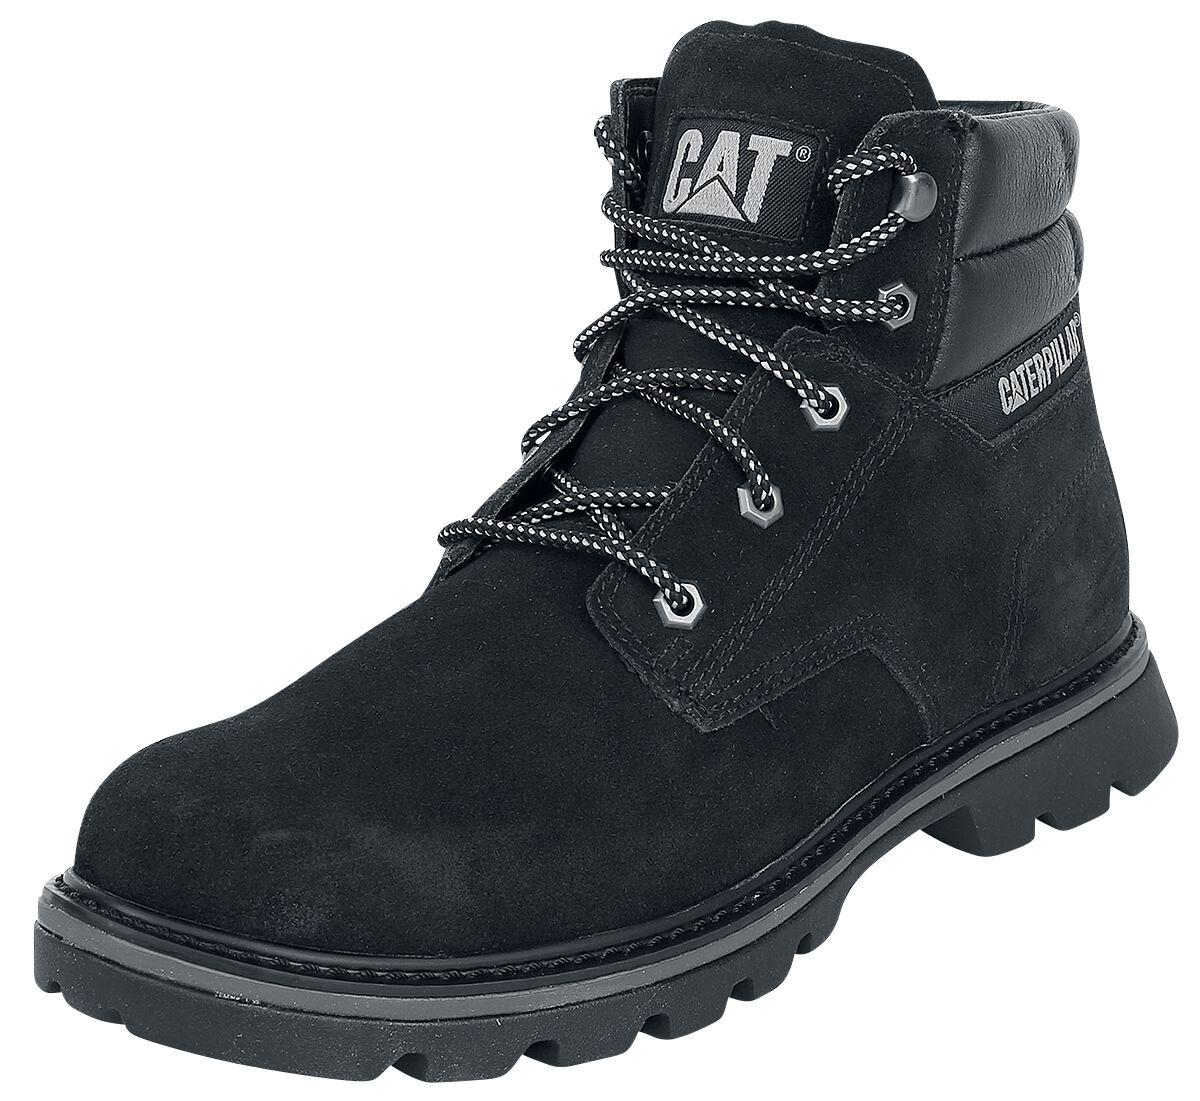 Image of CAT Footwear Quadrate Anfibi/Stivali nero